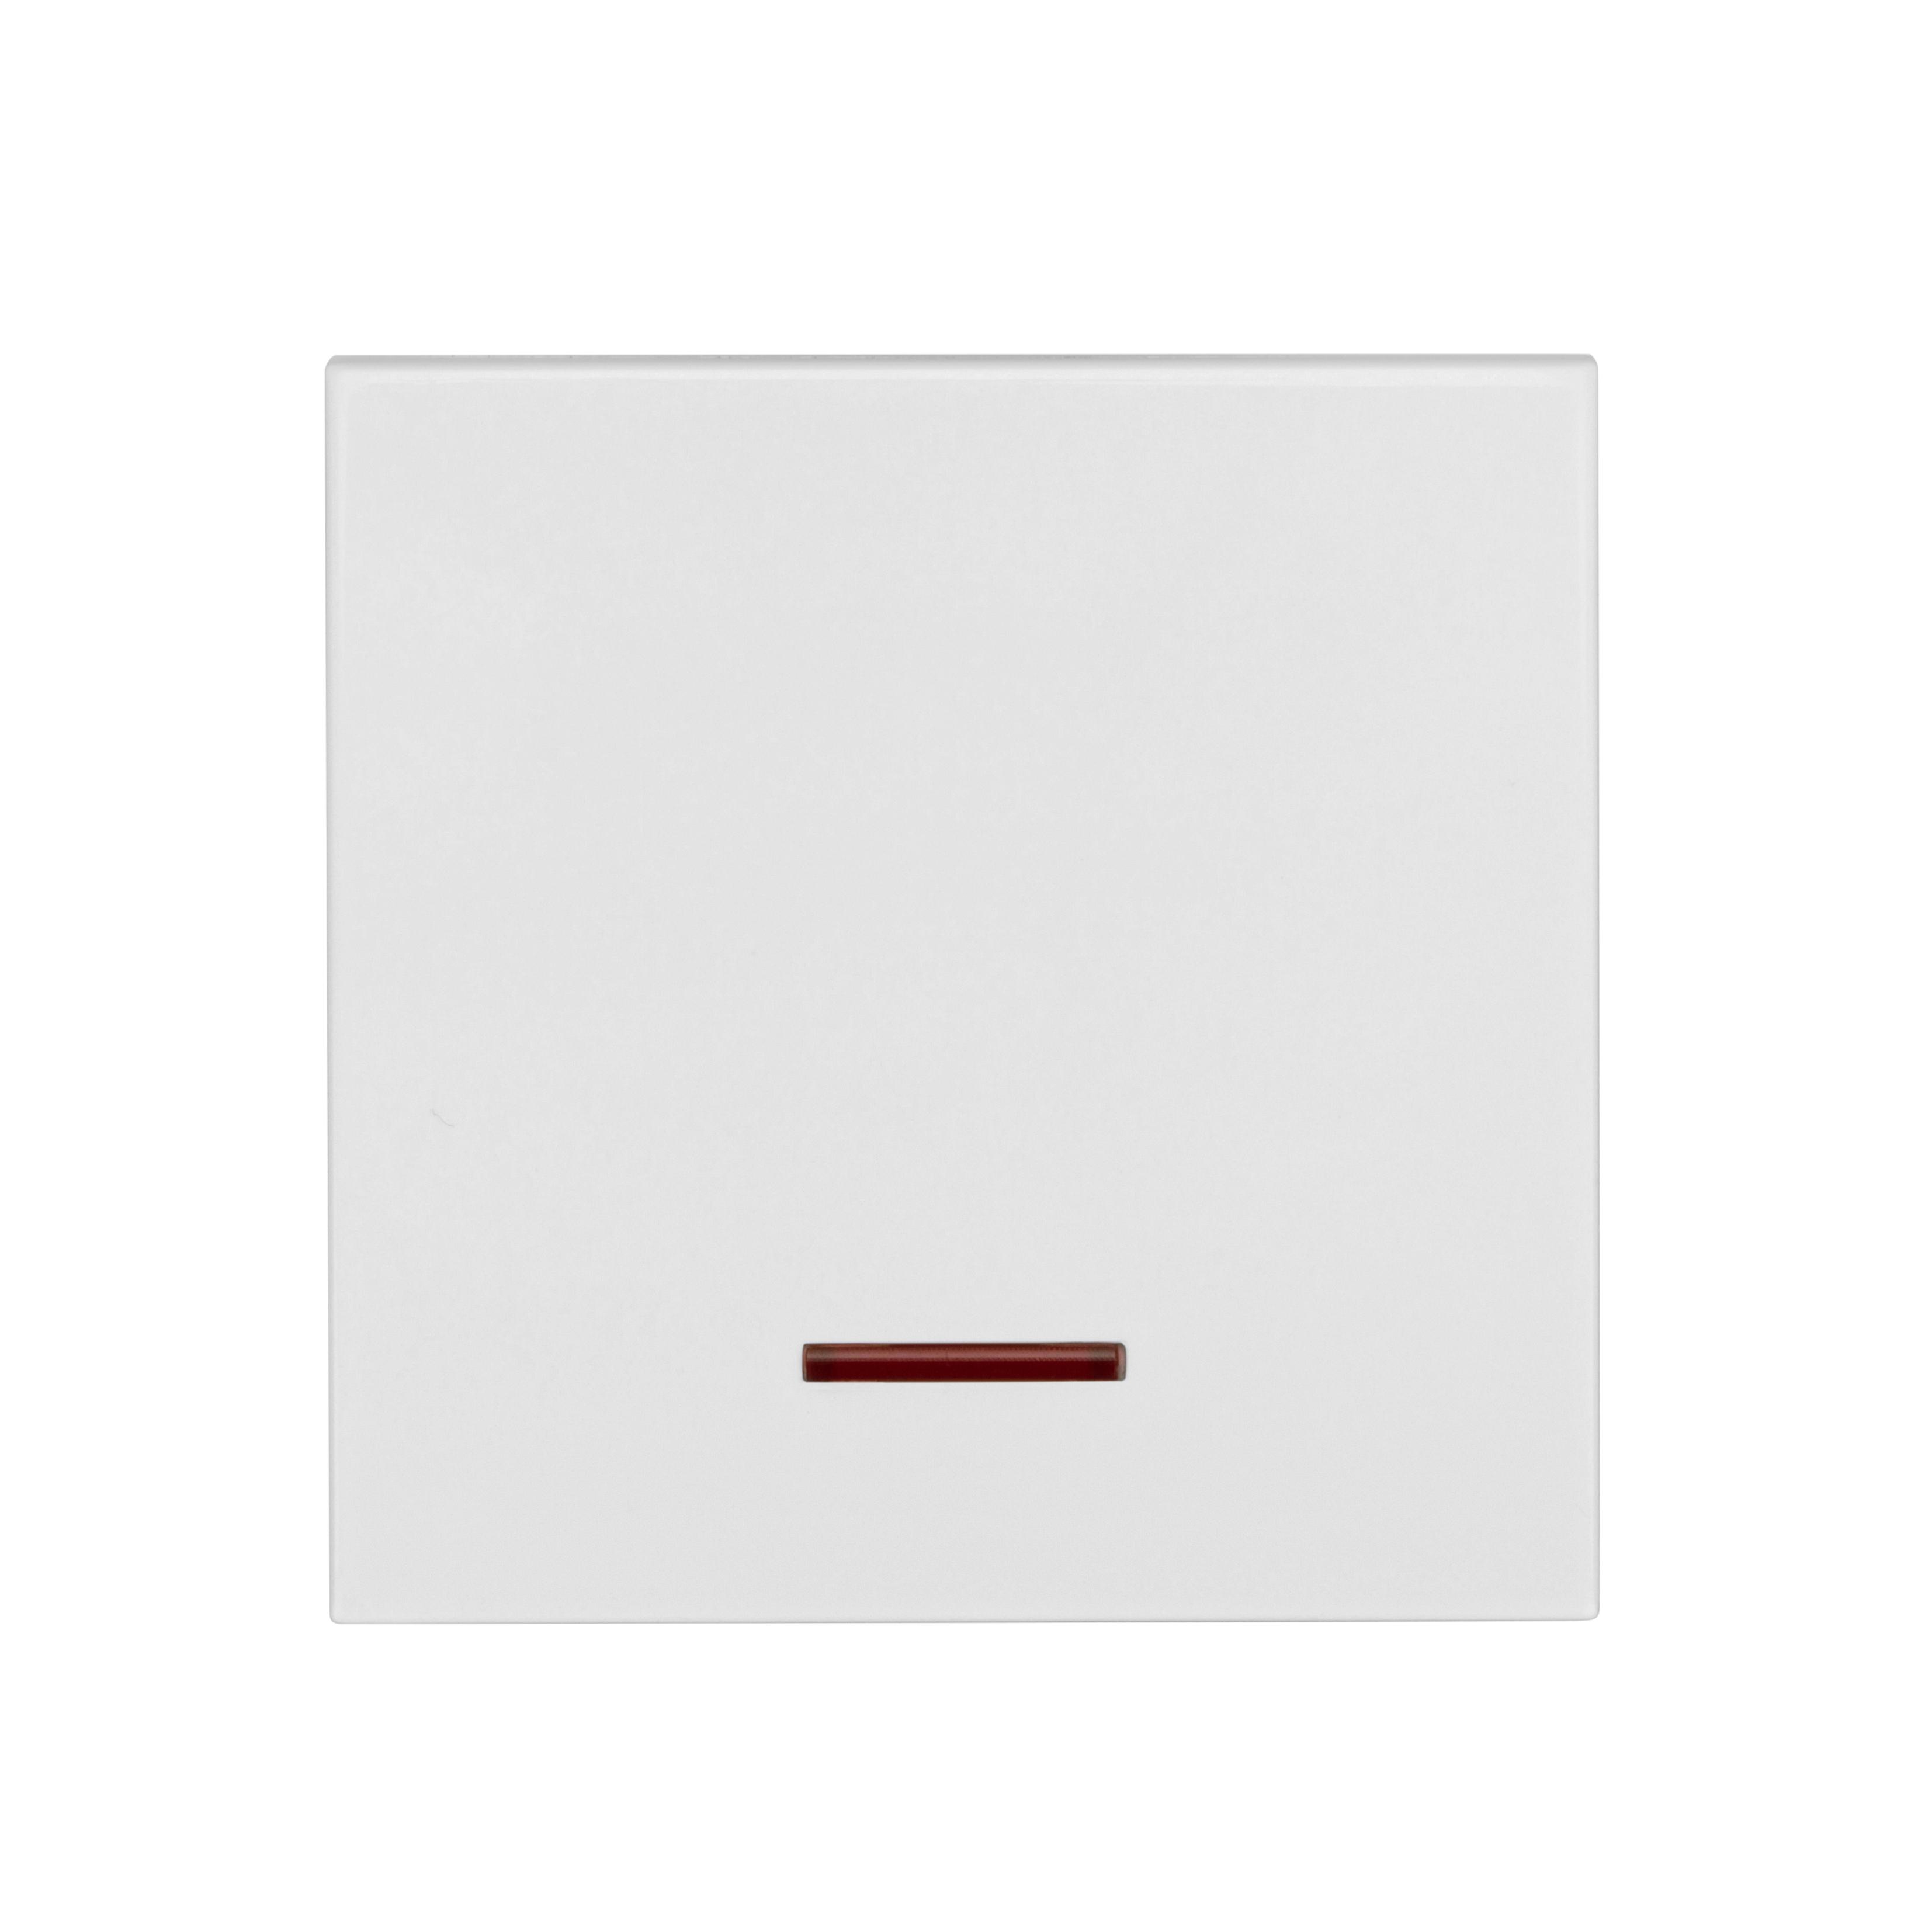 1 Stk Wippe mit roter Linse, weiß EV102008--